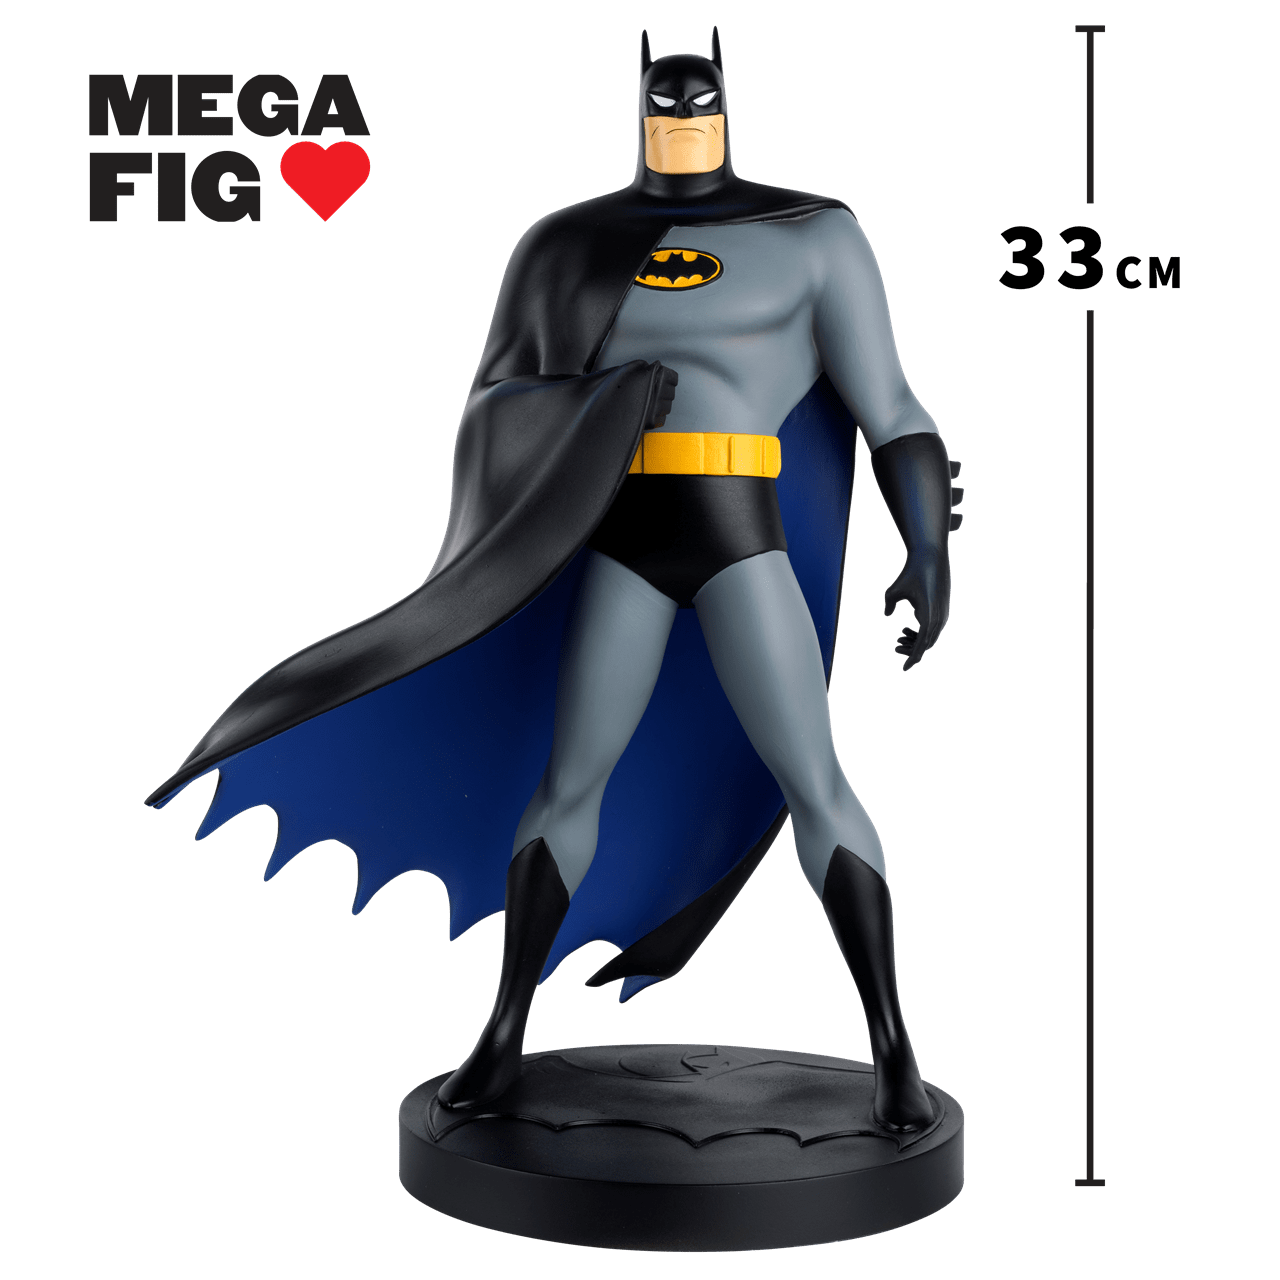 Batman Animation: DC Mega Figurine (online only) Hero Collector - 1